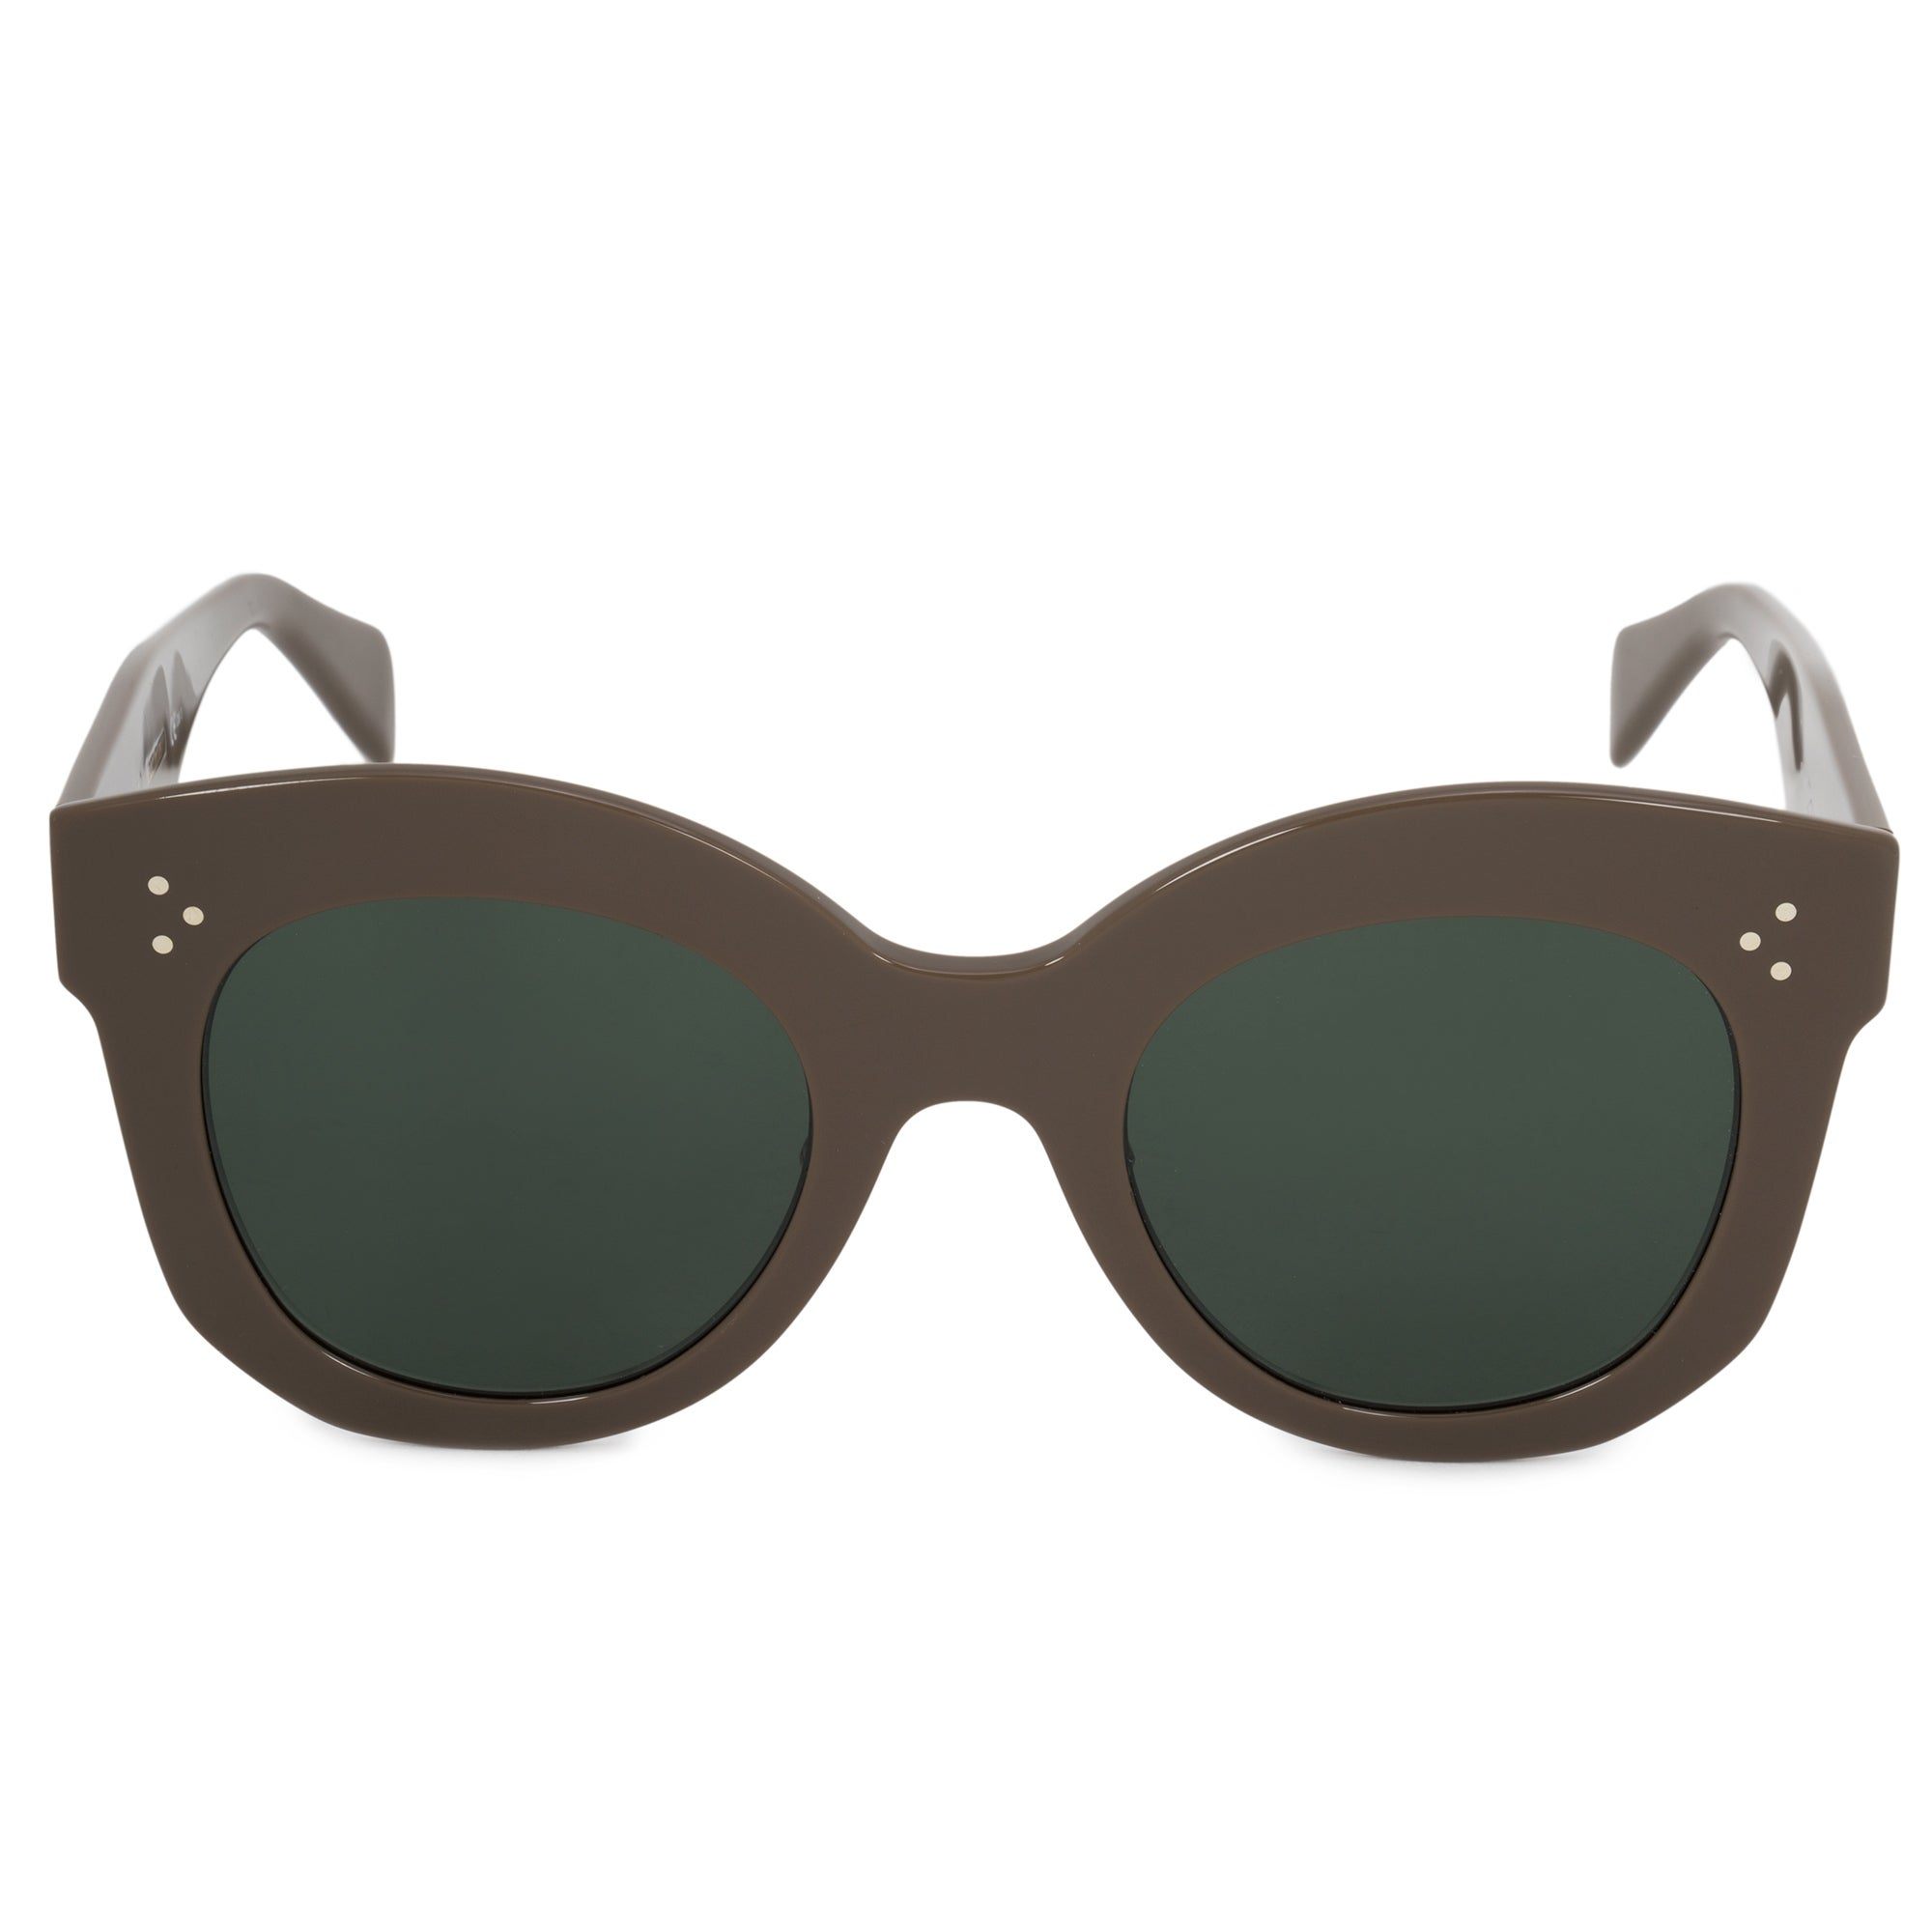 24aa3578dd3e Shop Celine Cat Eye Sunglasses 41443 S RYV O7 50 - On Sale - Free ...